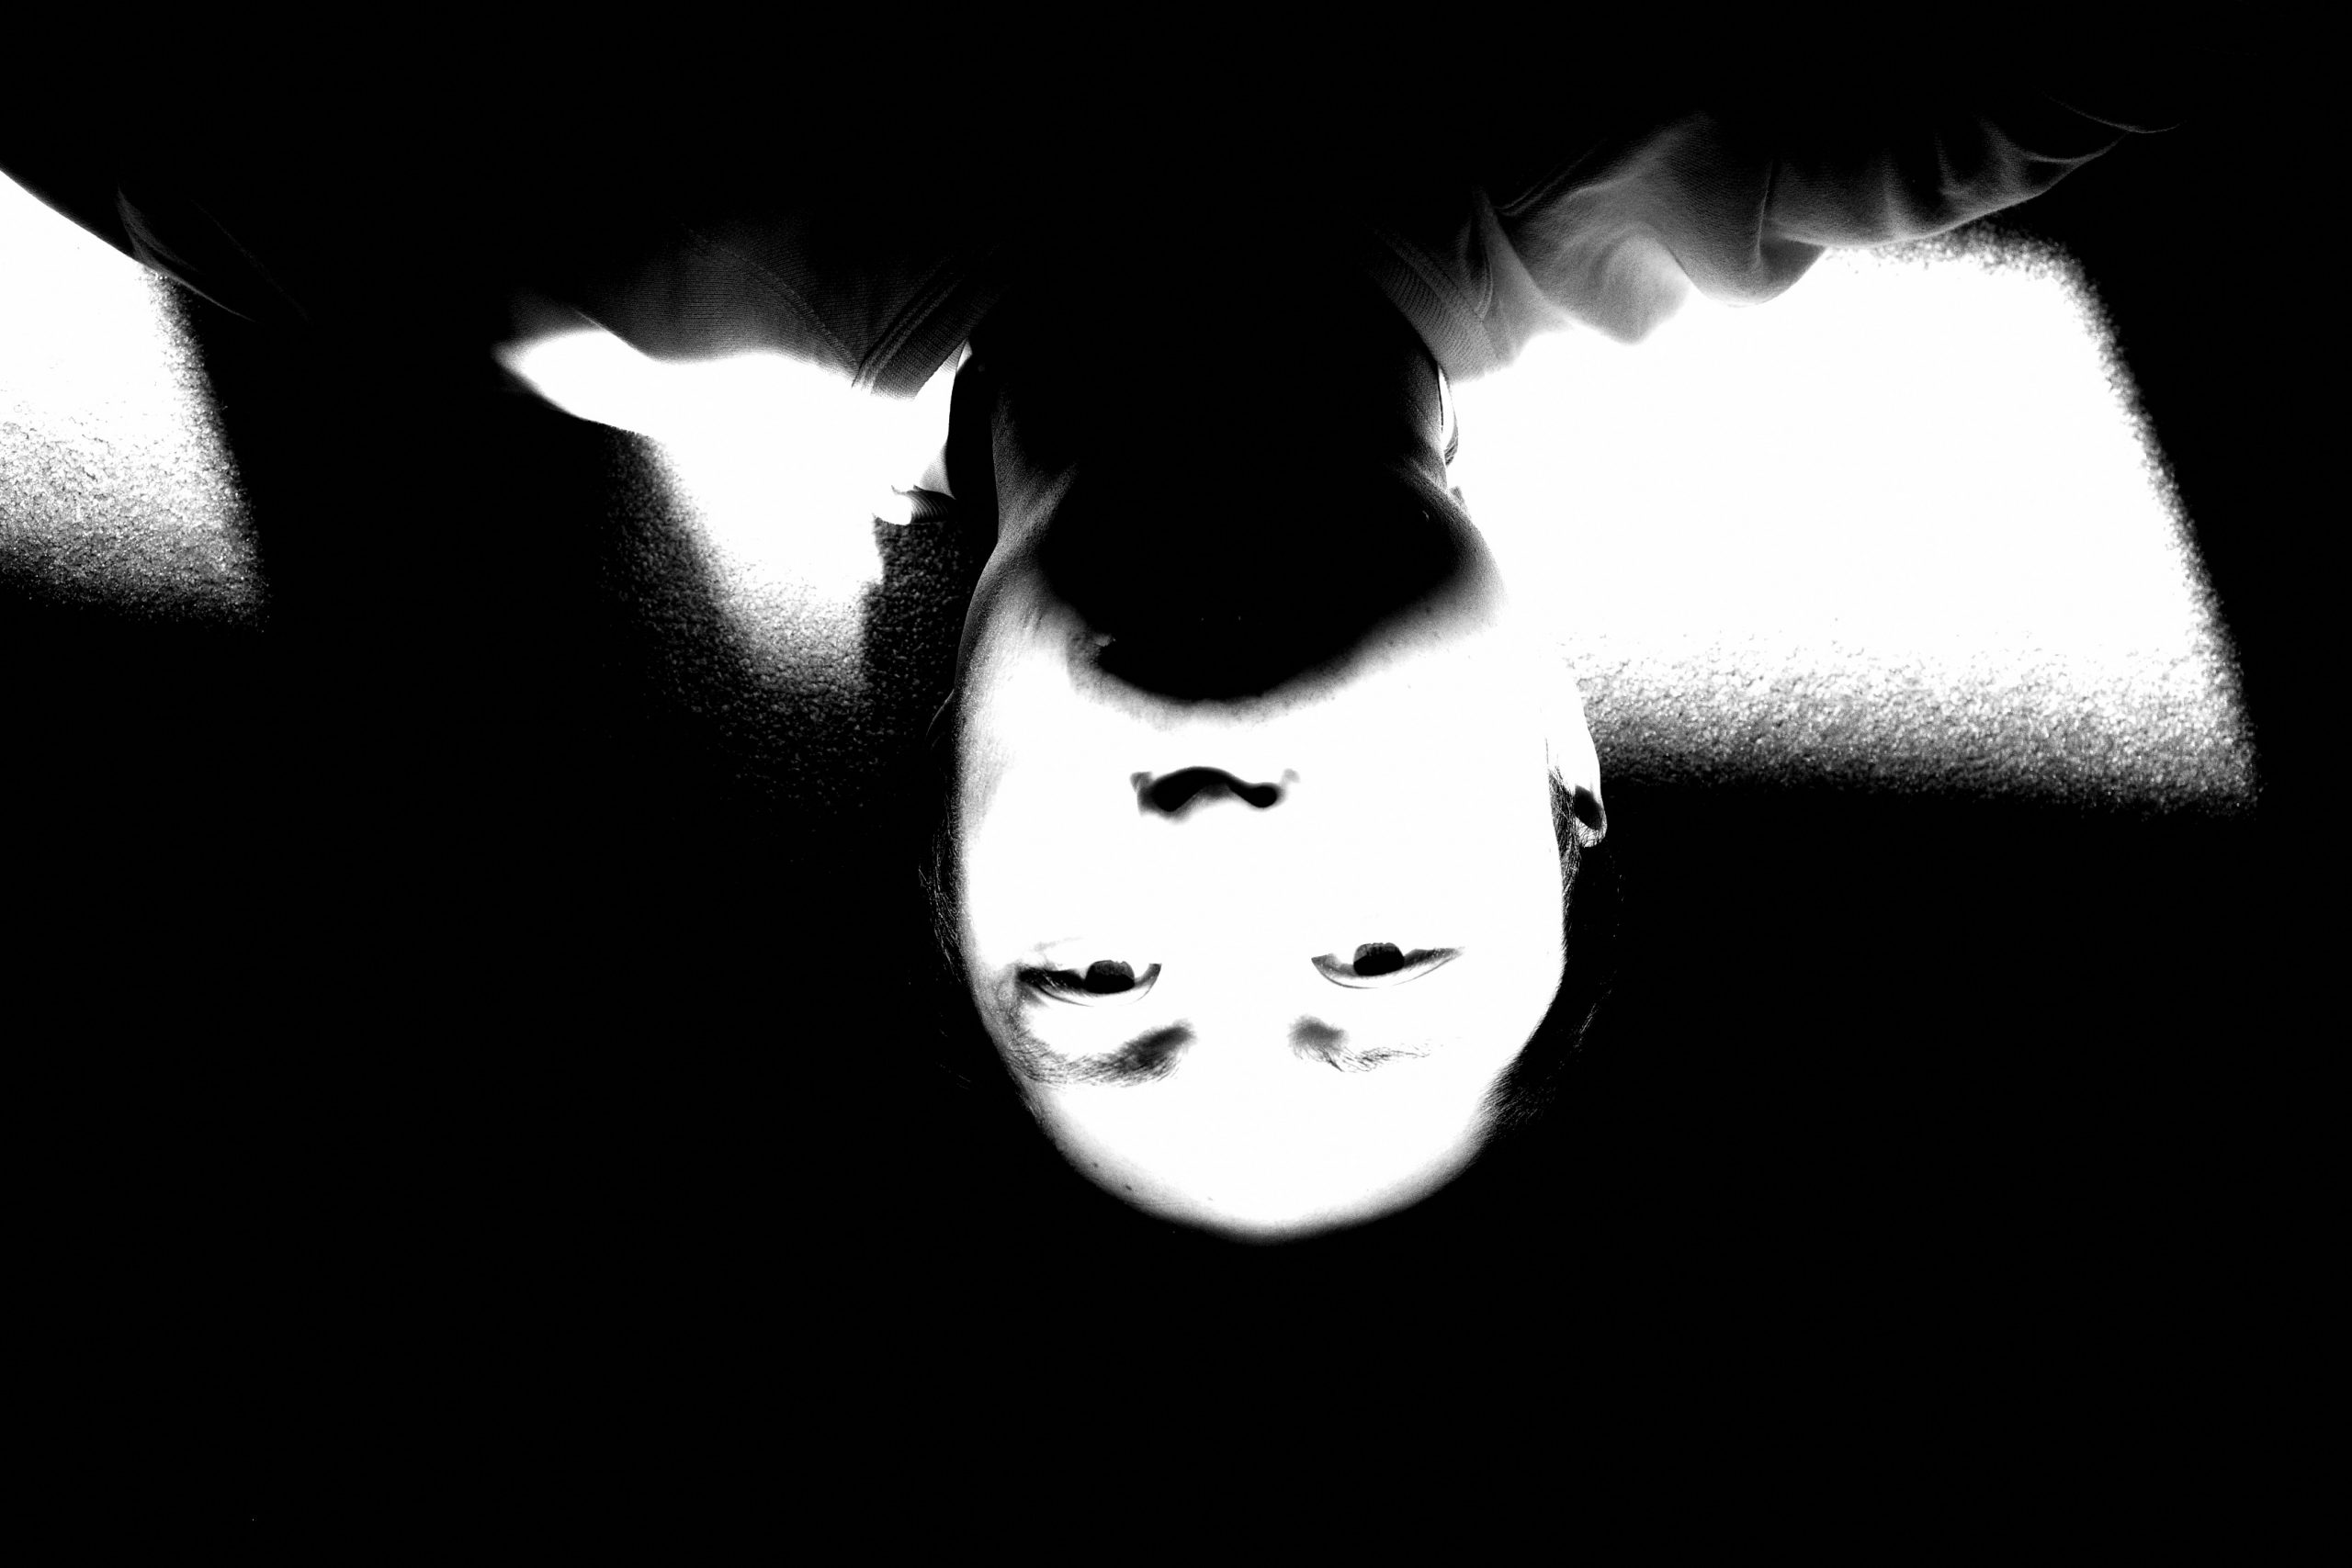 Upside down selfie ERIC KIM